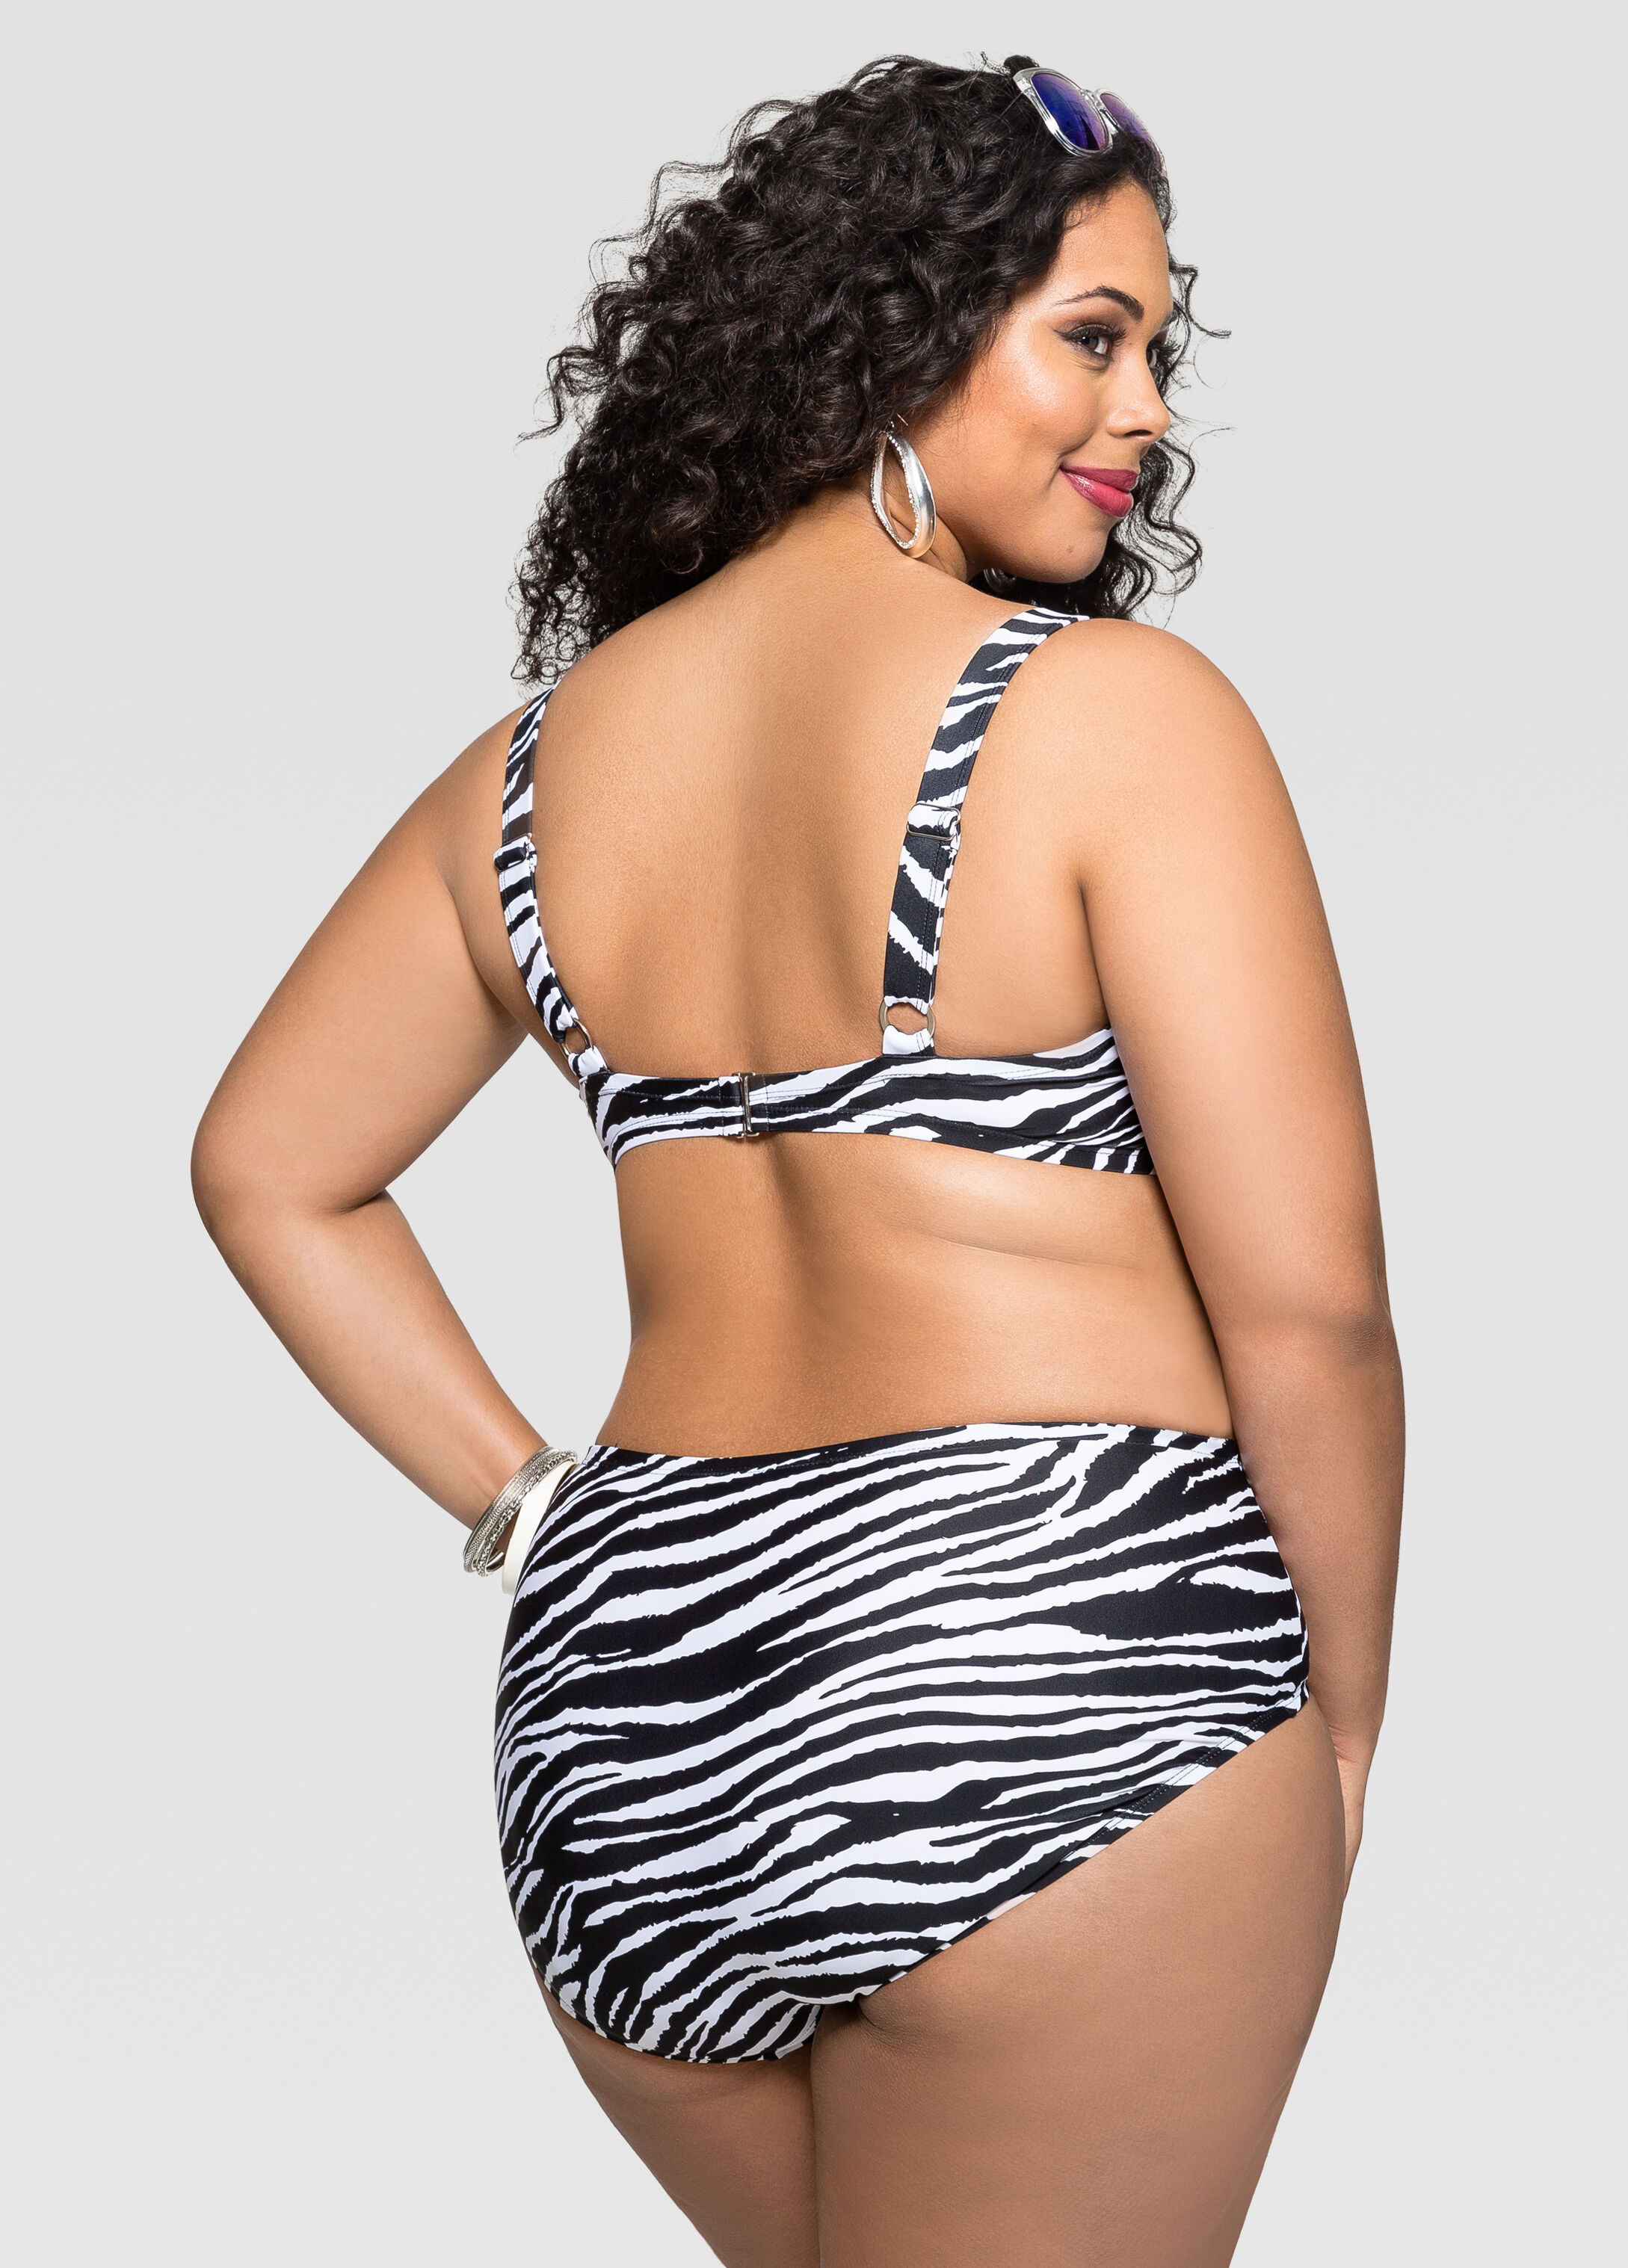 Zebra Print Bra Bikini Top